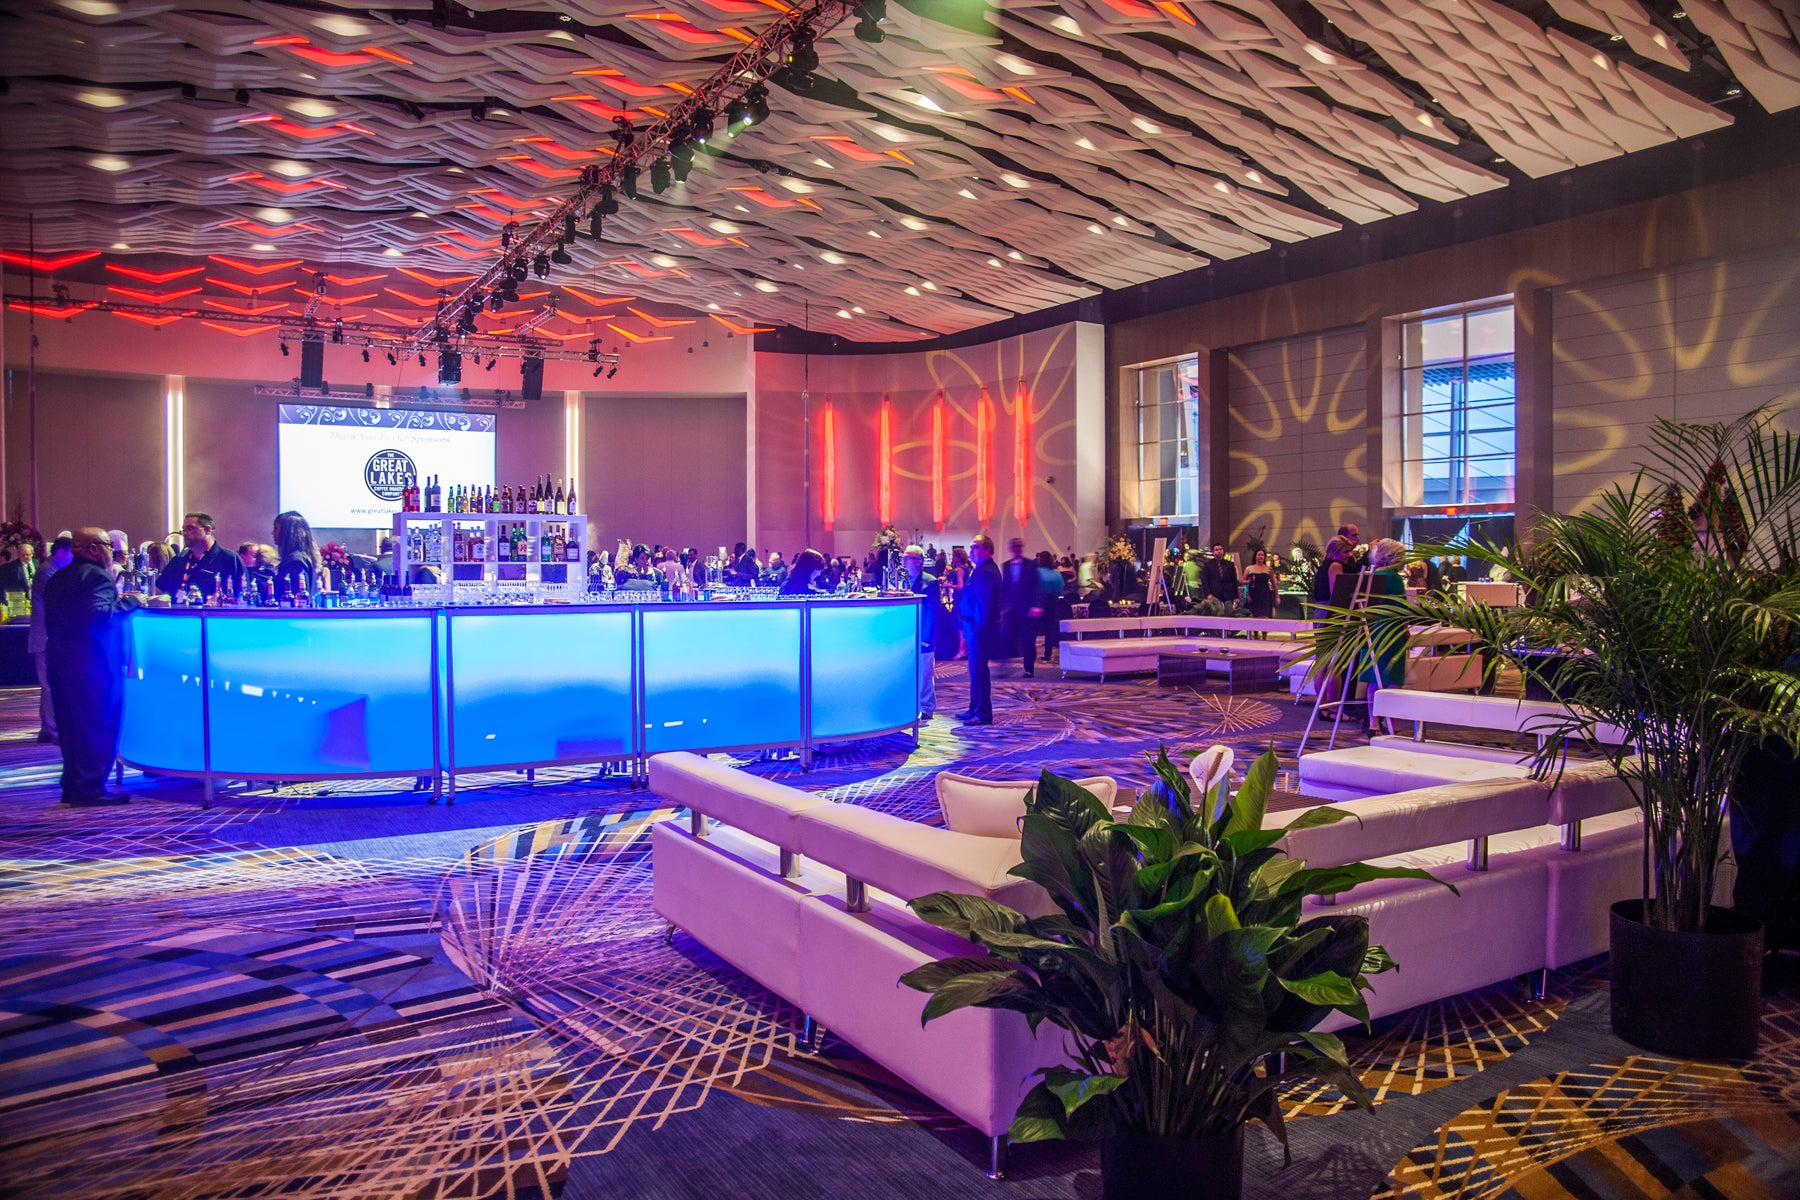 Grand River Ballroom